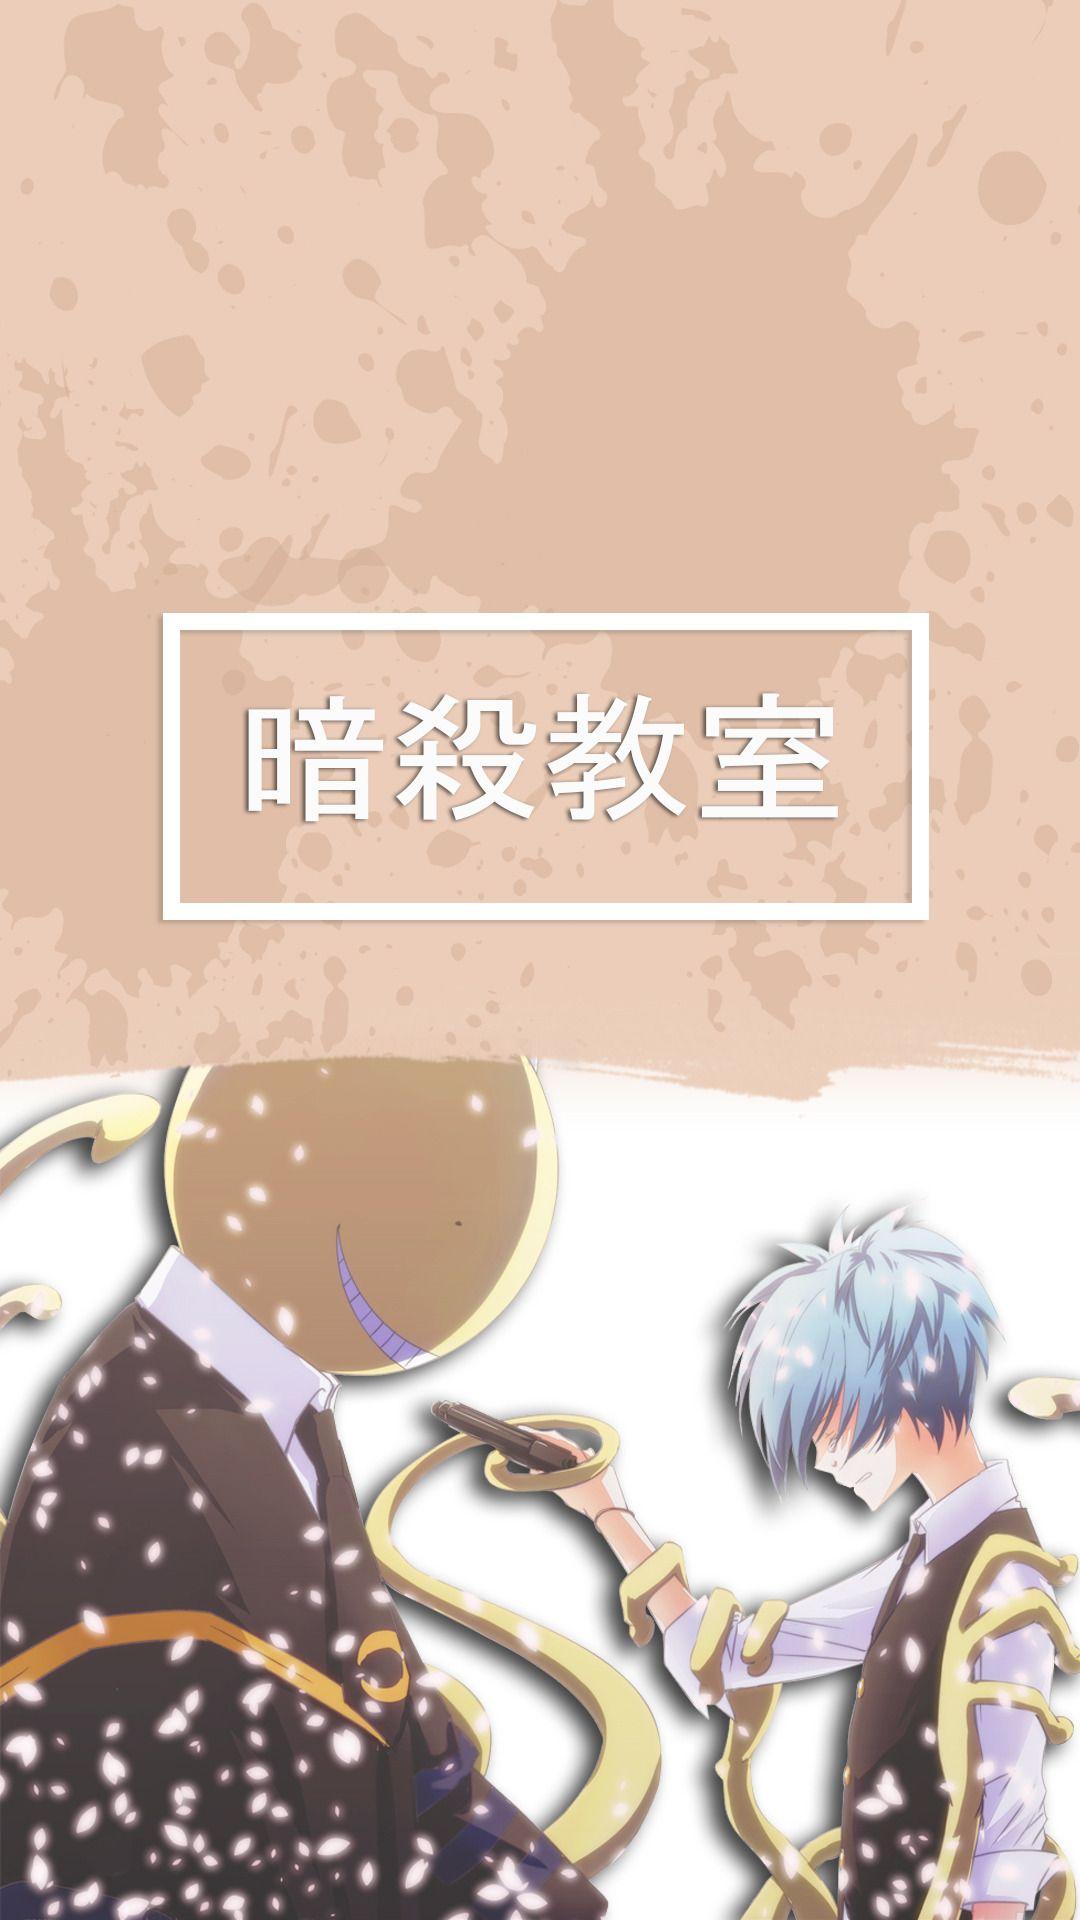 Wallpapers And Lockscreen Assassination Classroom Ansatsu Kyoushitsu Assassination Classroom Assasination Classroom Classroom